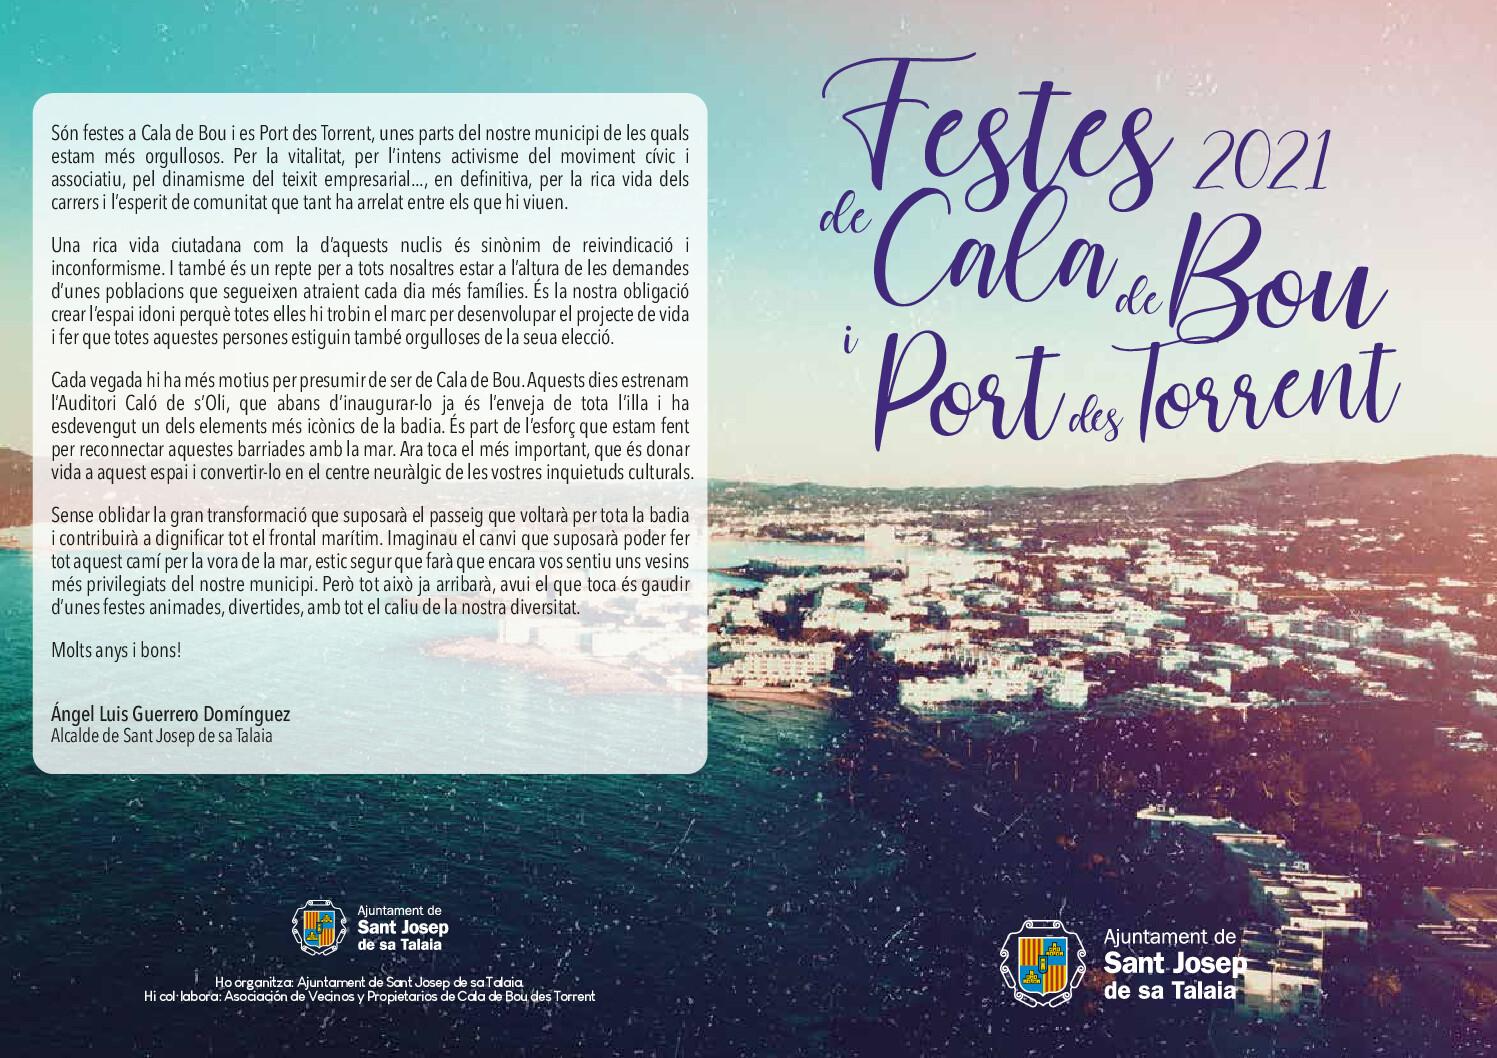 Fiestas von Cala de Bou